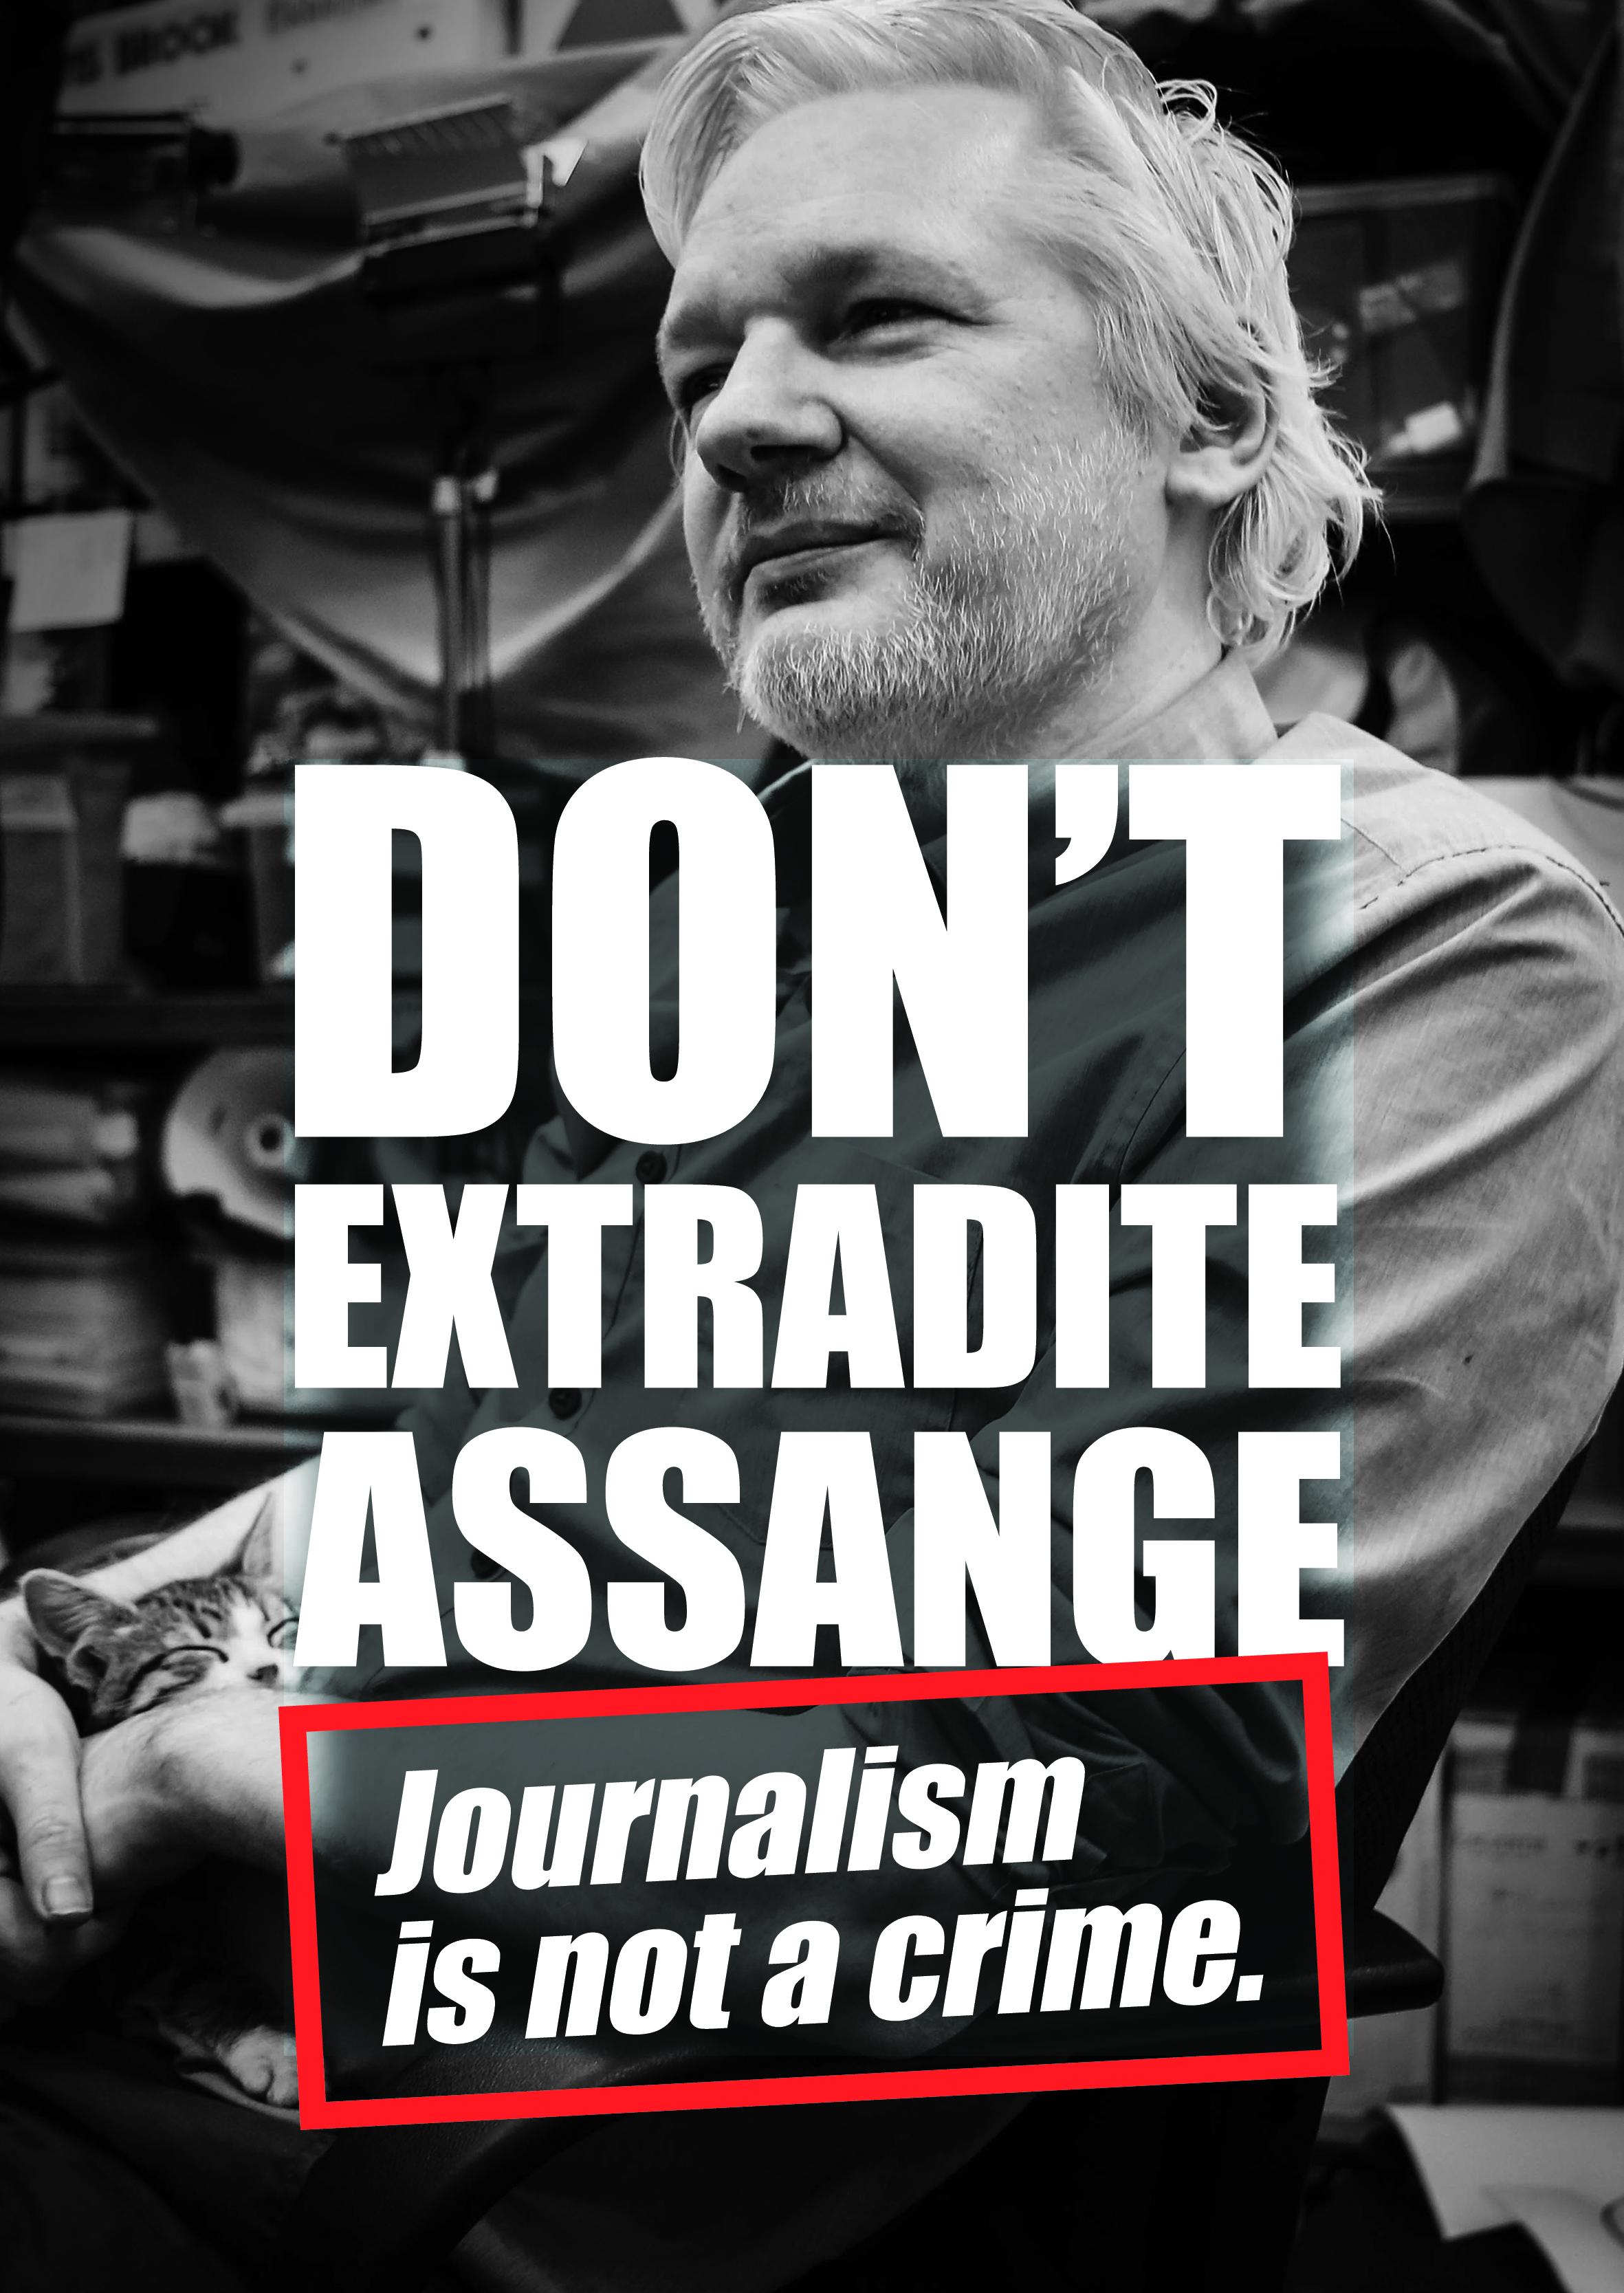 archivetempdont-extradite-assange-uk-a1poster2-3mmbleed.pdf.png